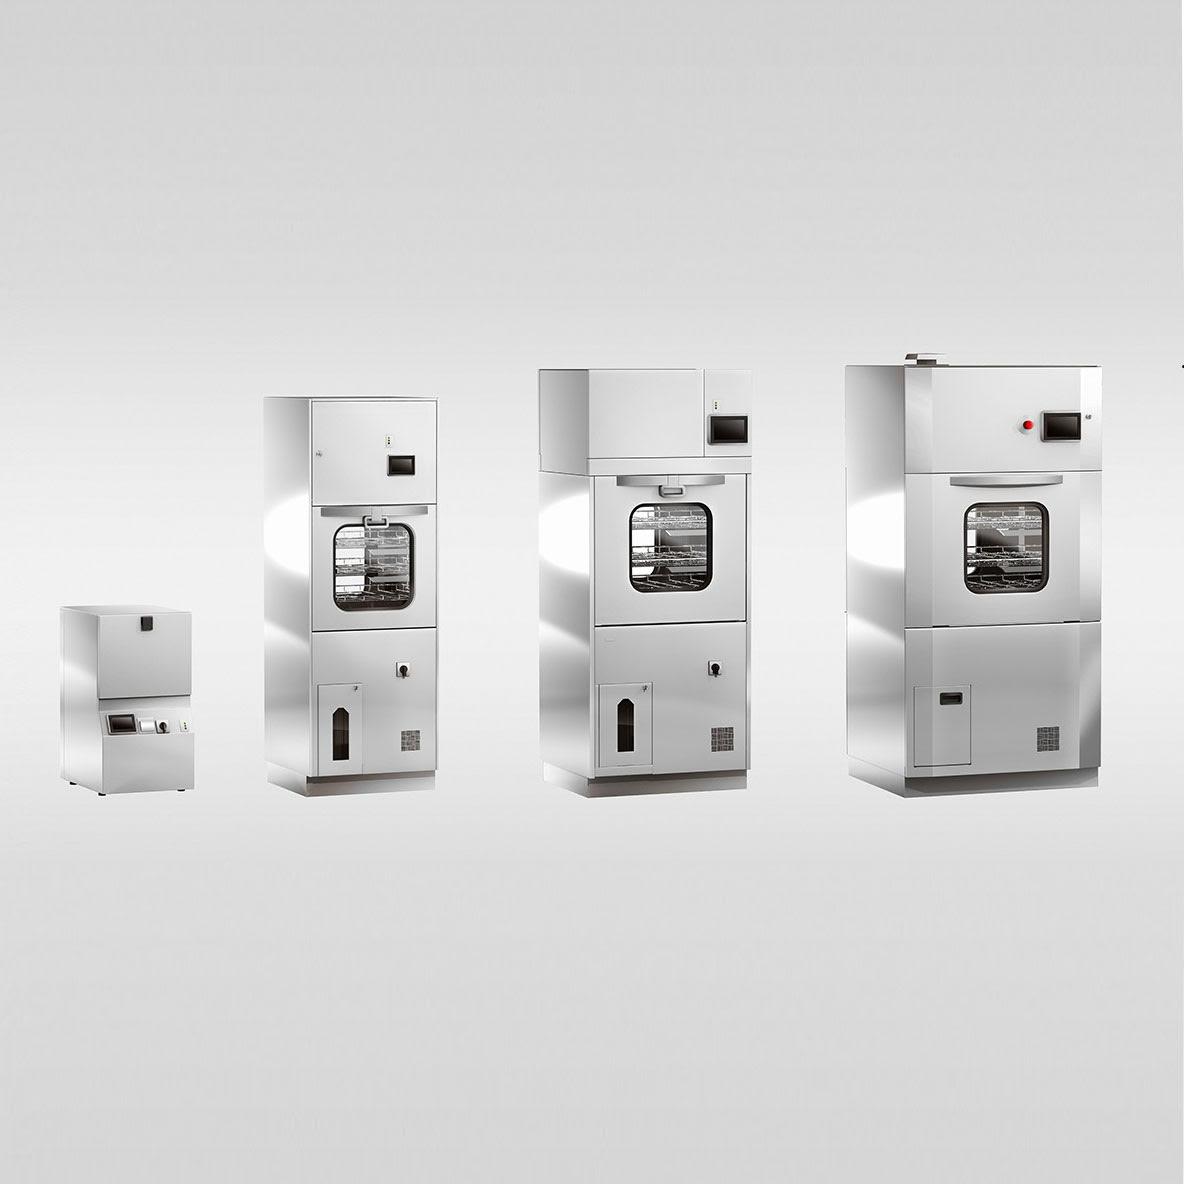 Dekomeds Range of Washer Disinfectors